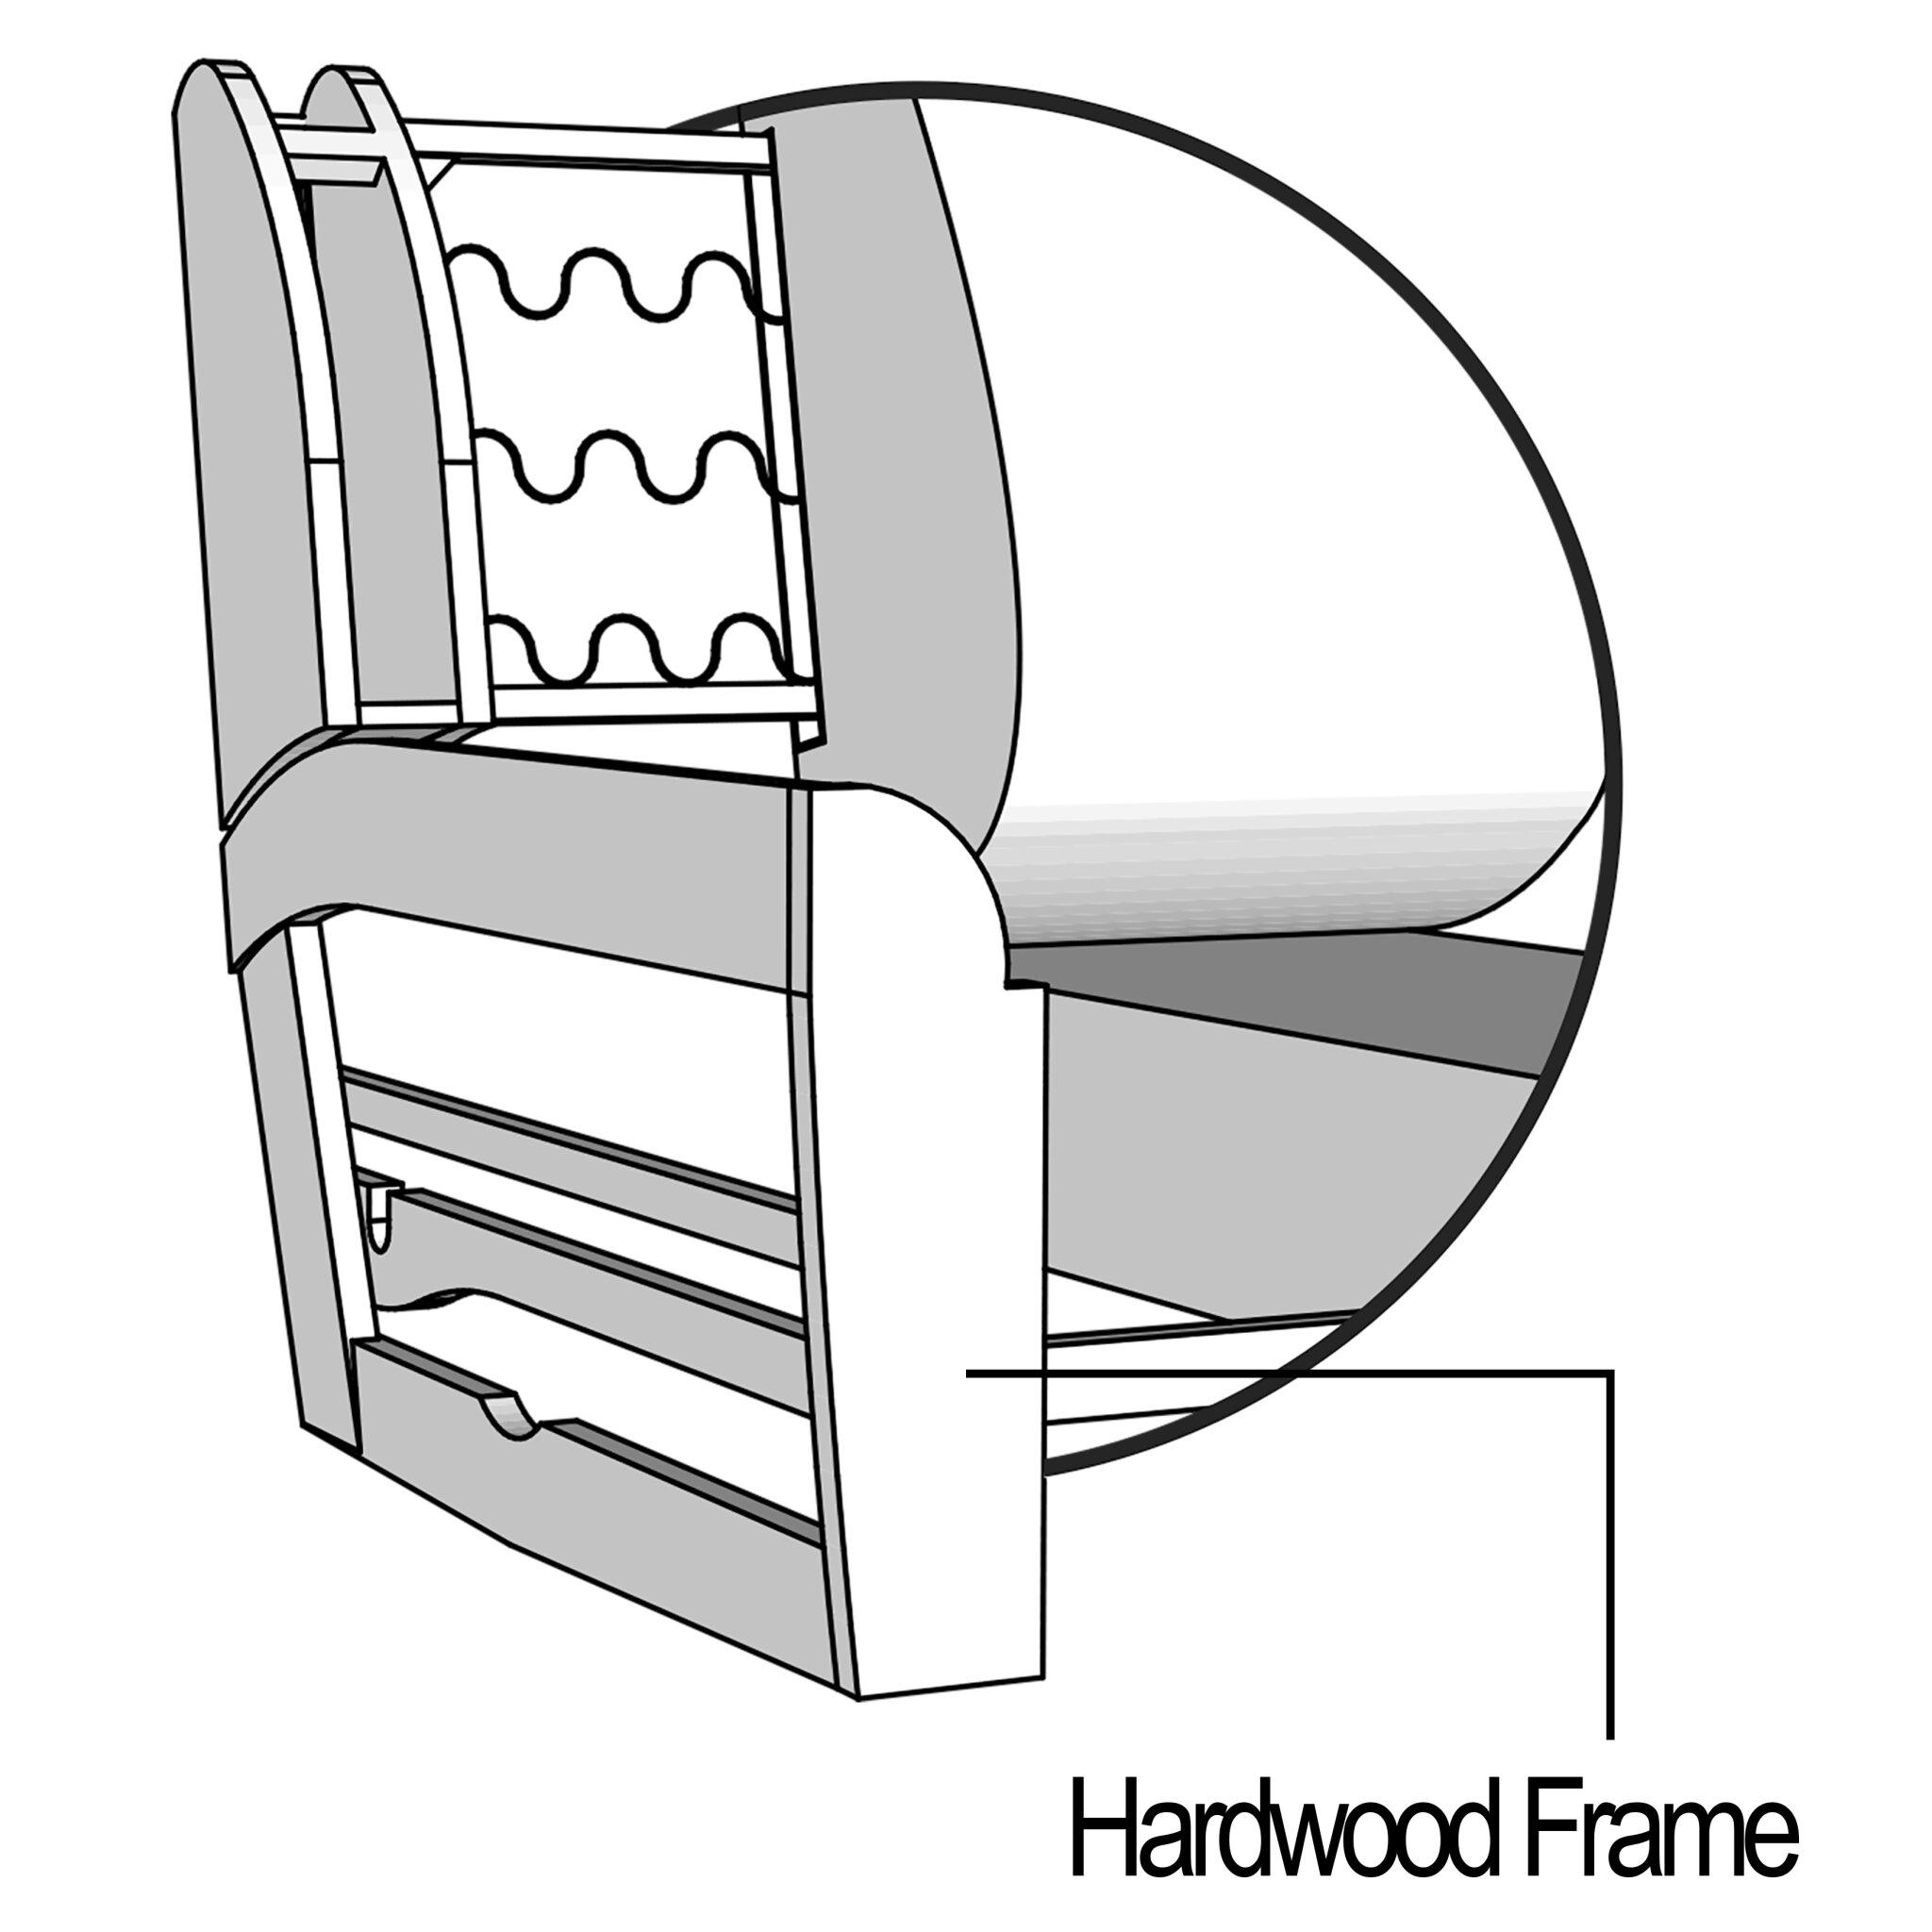 Sturdy Hardwood Frame